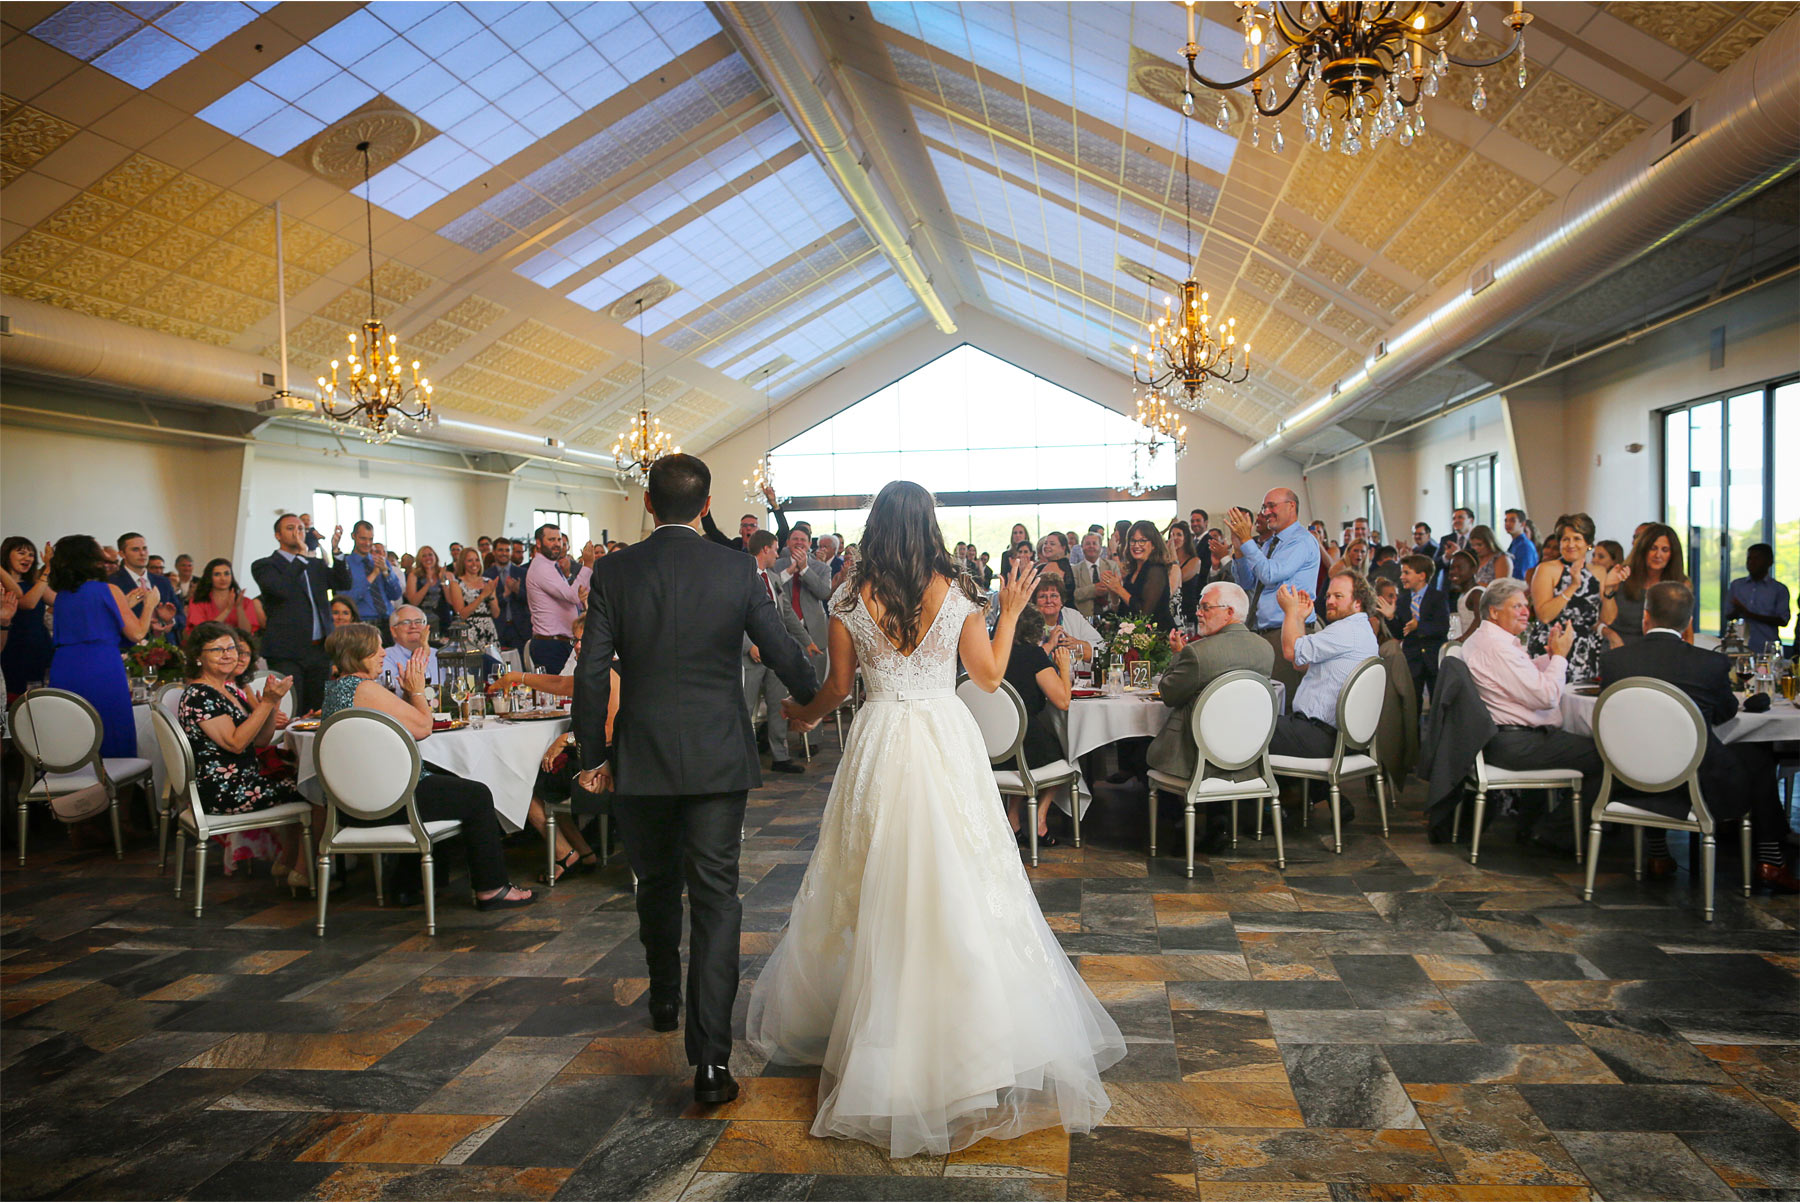 17-Weding-by-Vick-Photography-Minneapolis-Minnesota-Bavaria-Downs-Reception-Bride-Groom-Rebecca-and-Mark.jpg